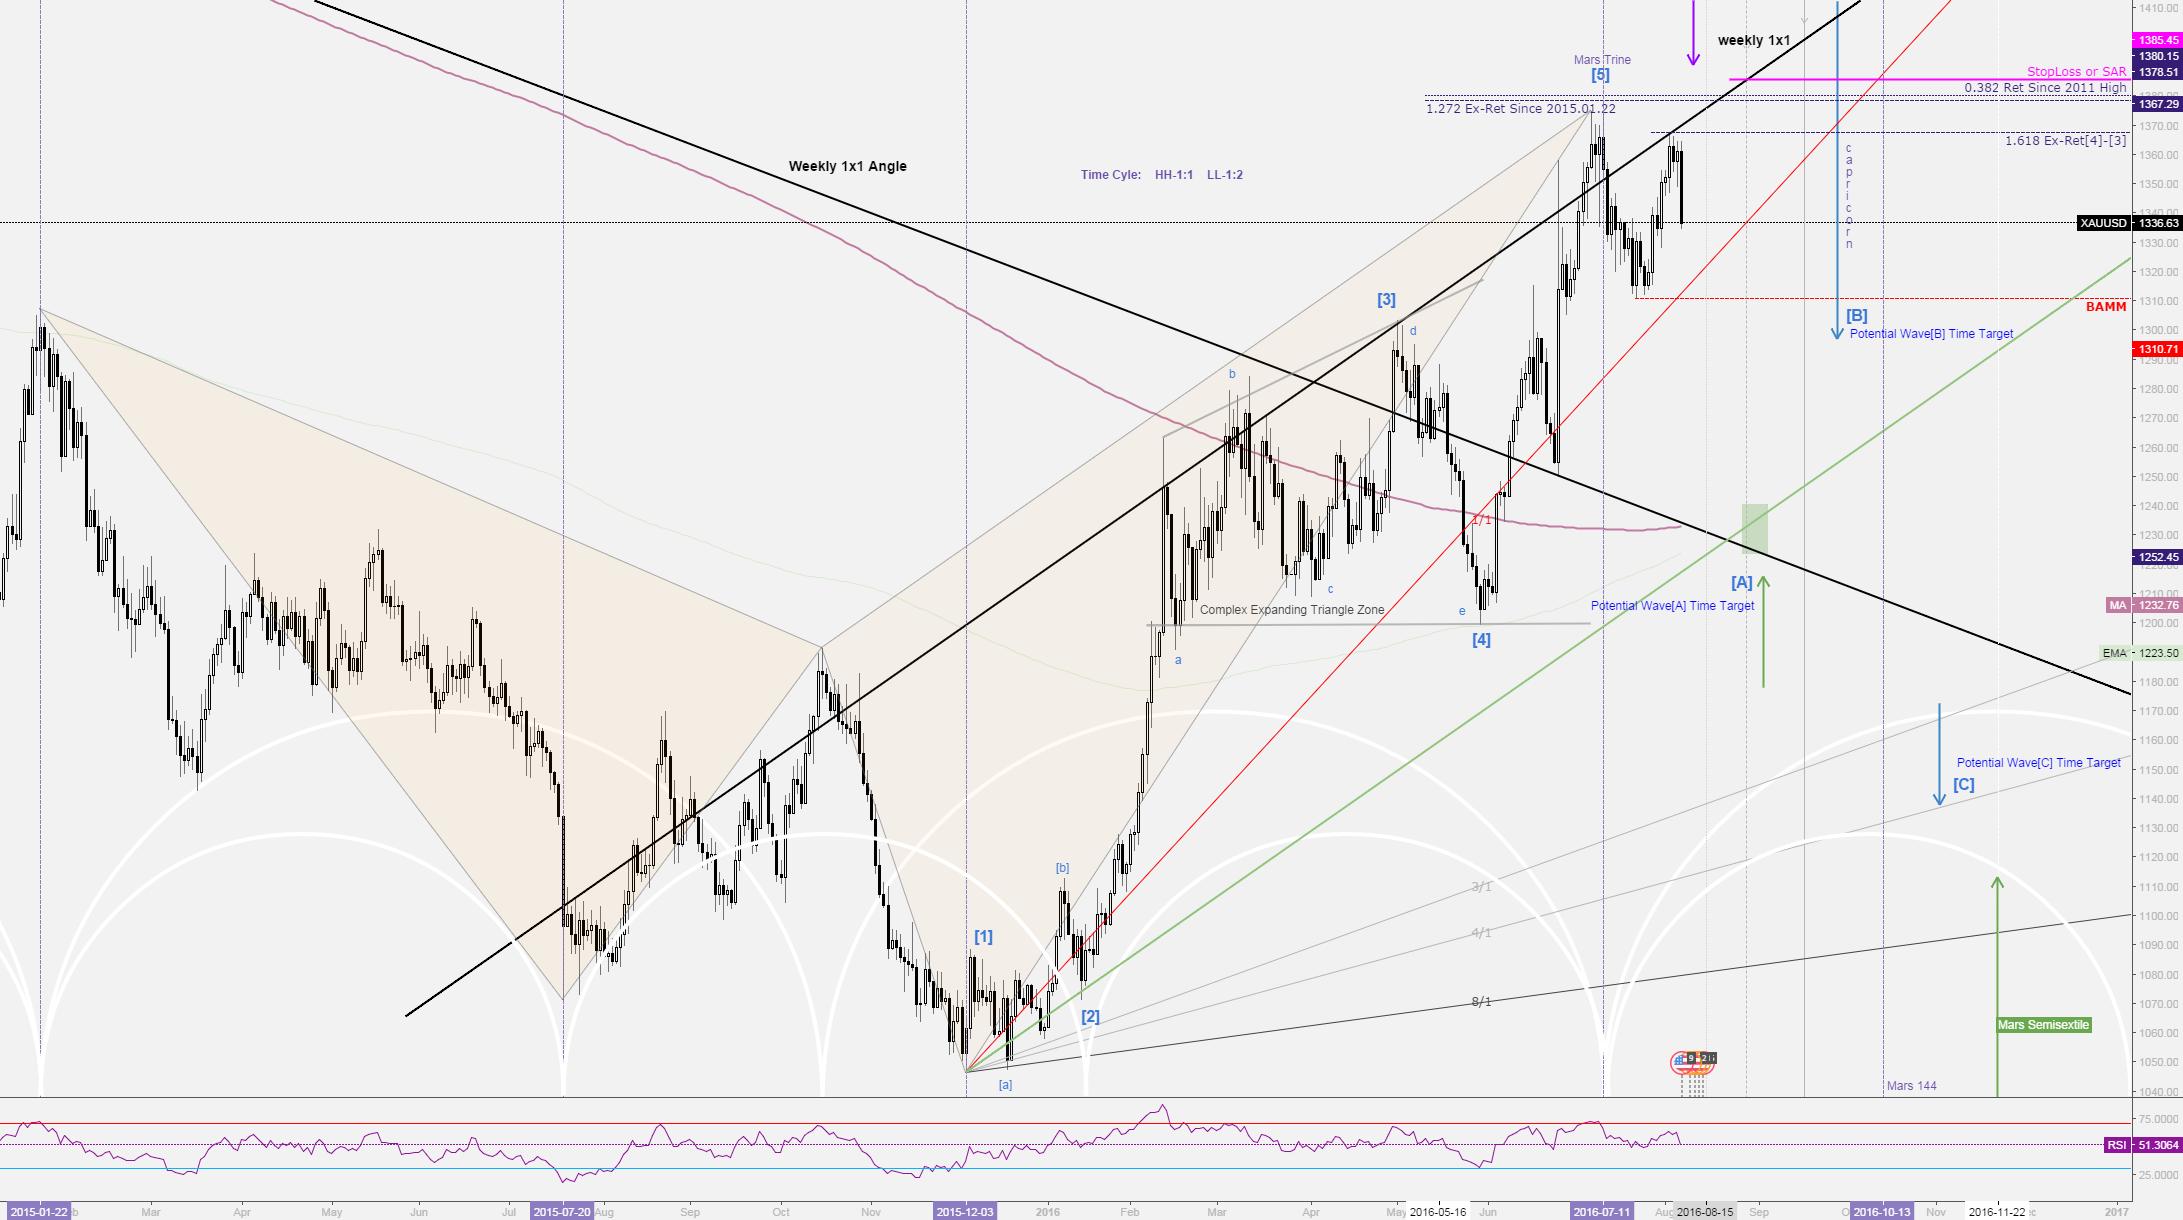 ***GOLD Daily Swing Trade Setup-Bearish Pattern***